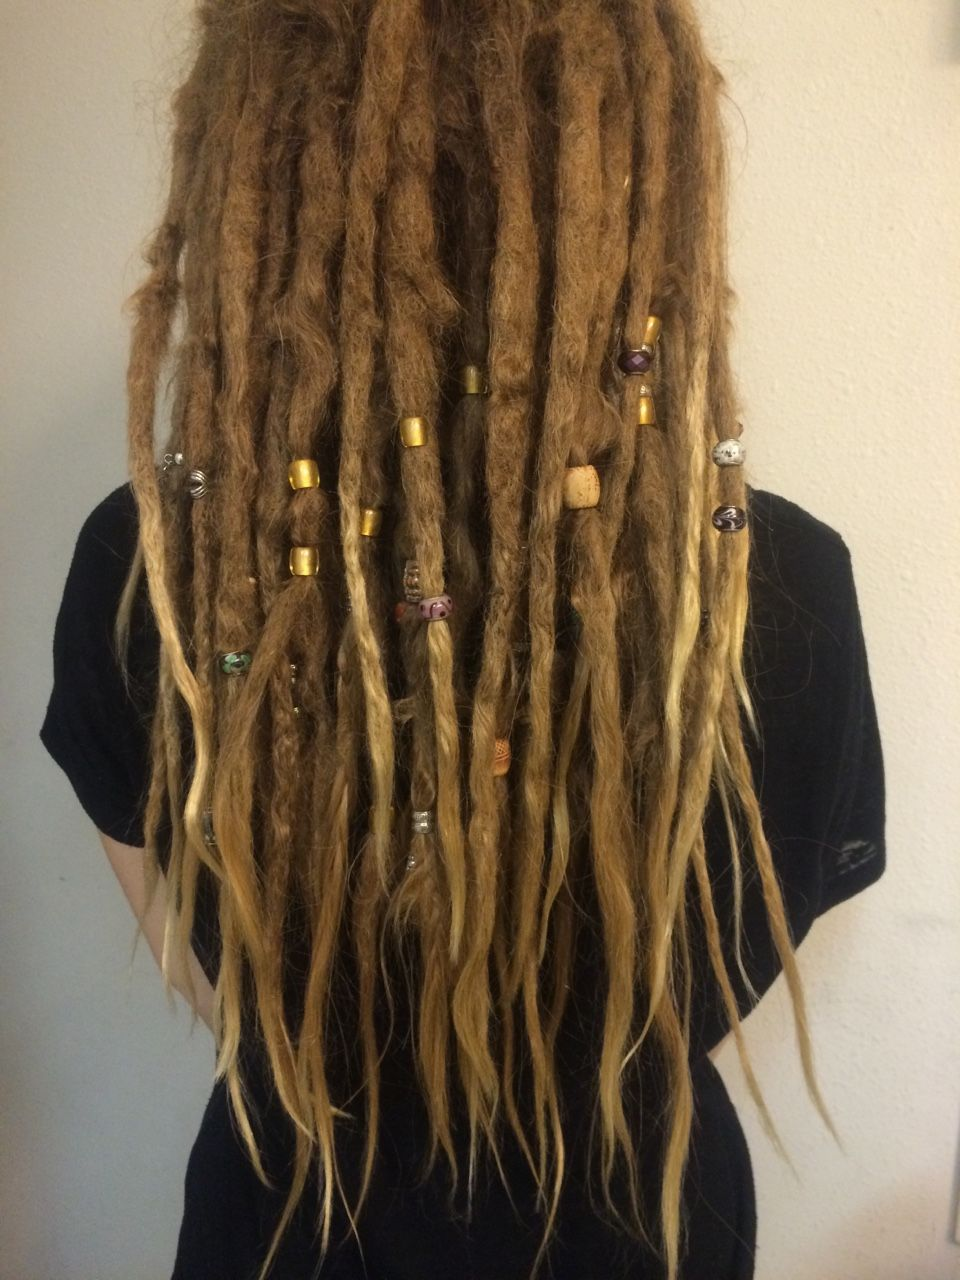 Dreadlock Hair Tie for Dreads Elastic Adjustable with Beads Dread Dreadlock Band